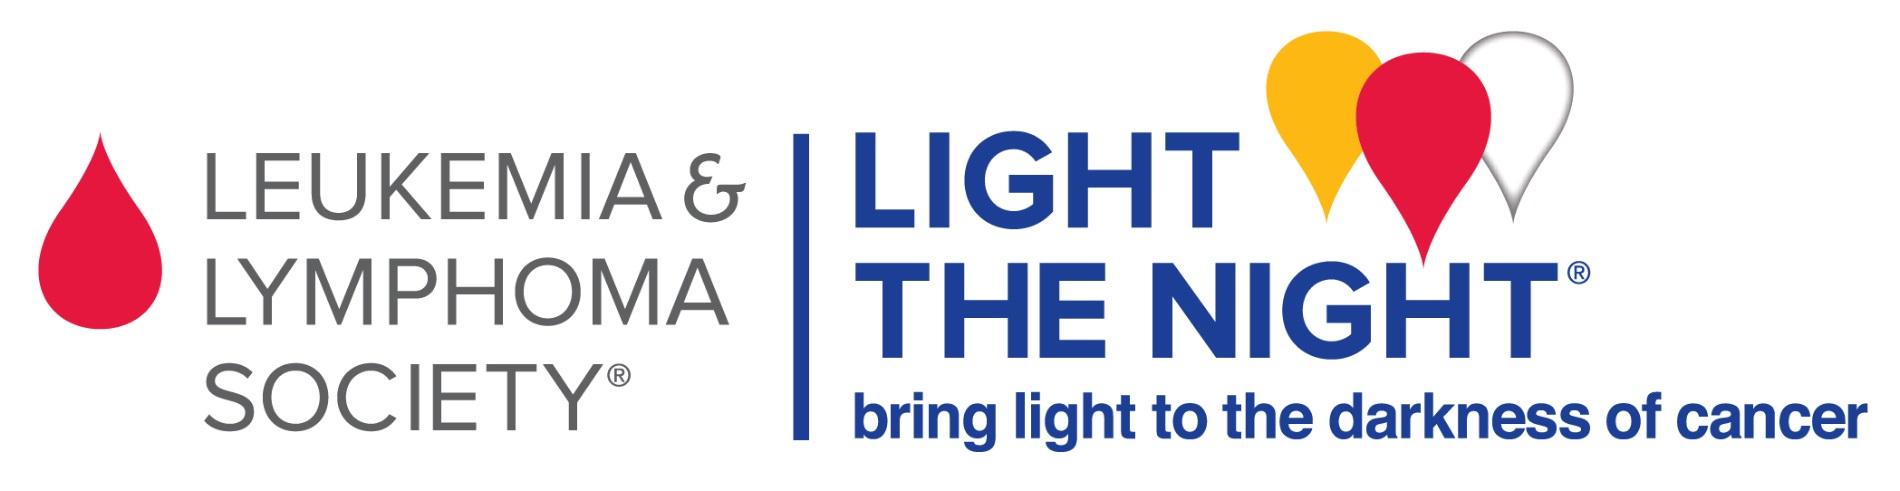 LTN logo with tag line.jpg